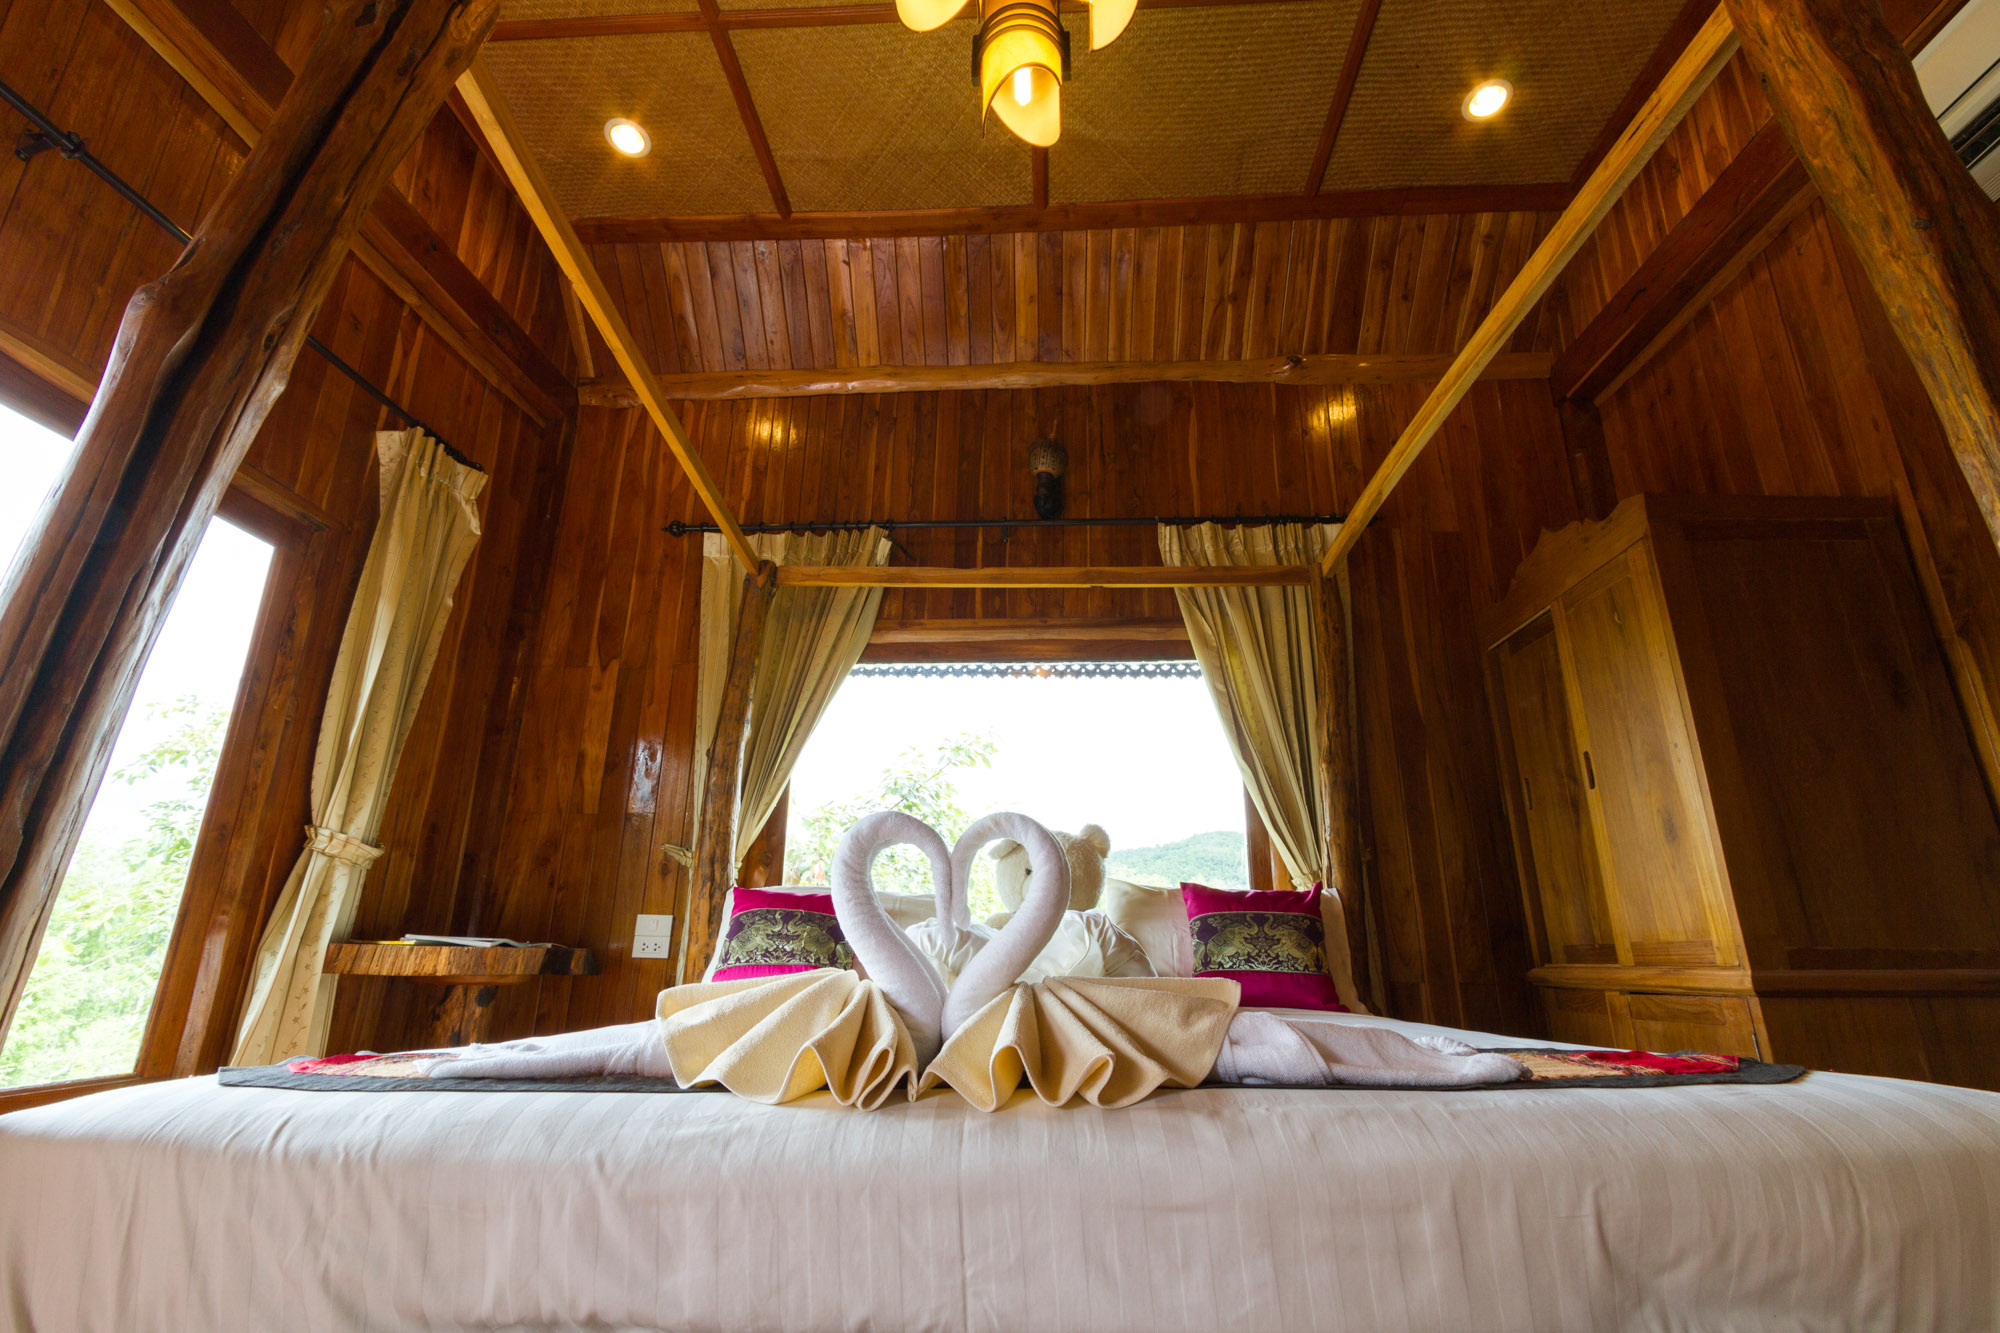 Mokfahsai Resort หมอกฟ้าใส รีสอร์ท  หมอกฟ้าใสรีสอร์ท Swiss Zealand แห่งเดียวบนเนินเขาแม่สอด IMG 9209